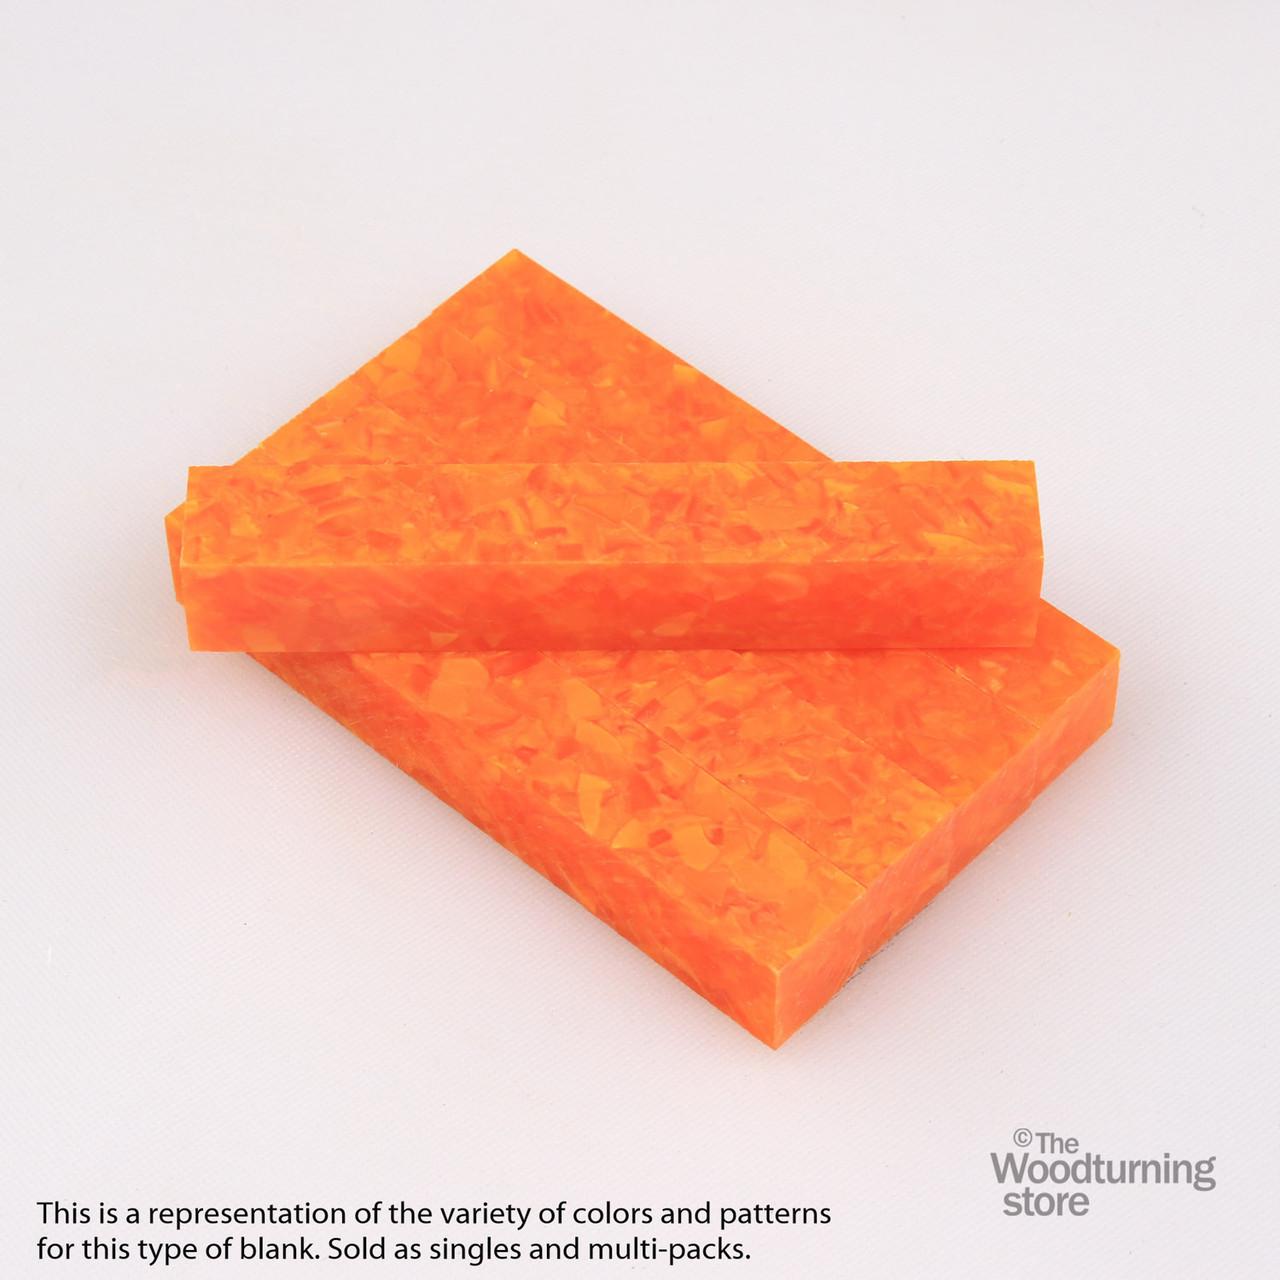 Legacy Acrylic Pen Blank - Bright Orange with White Crush, Single Blank